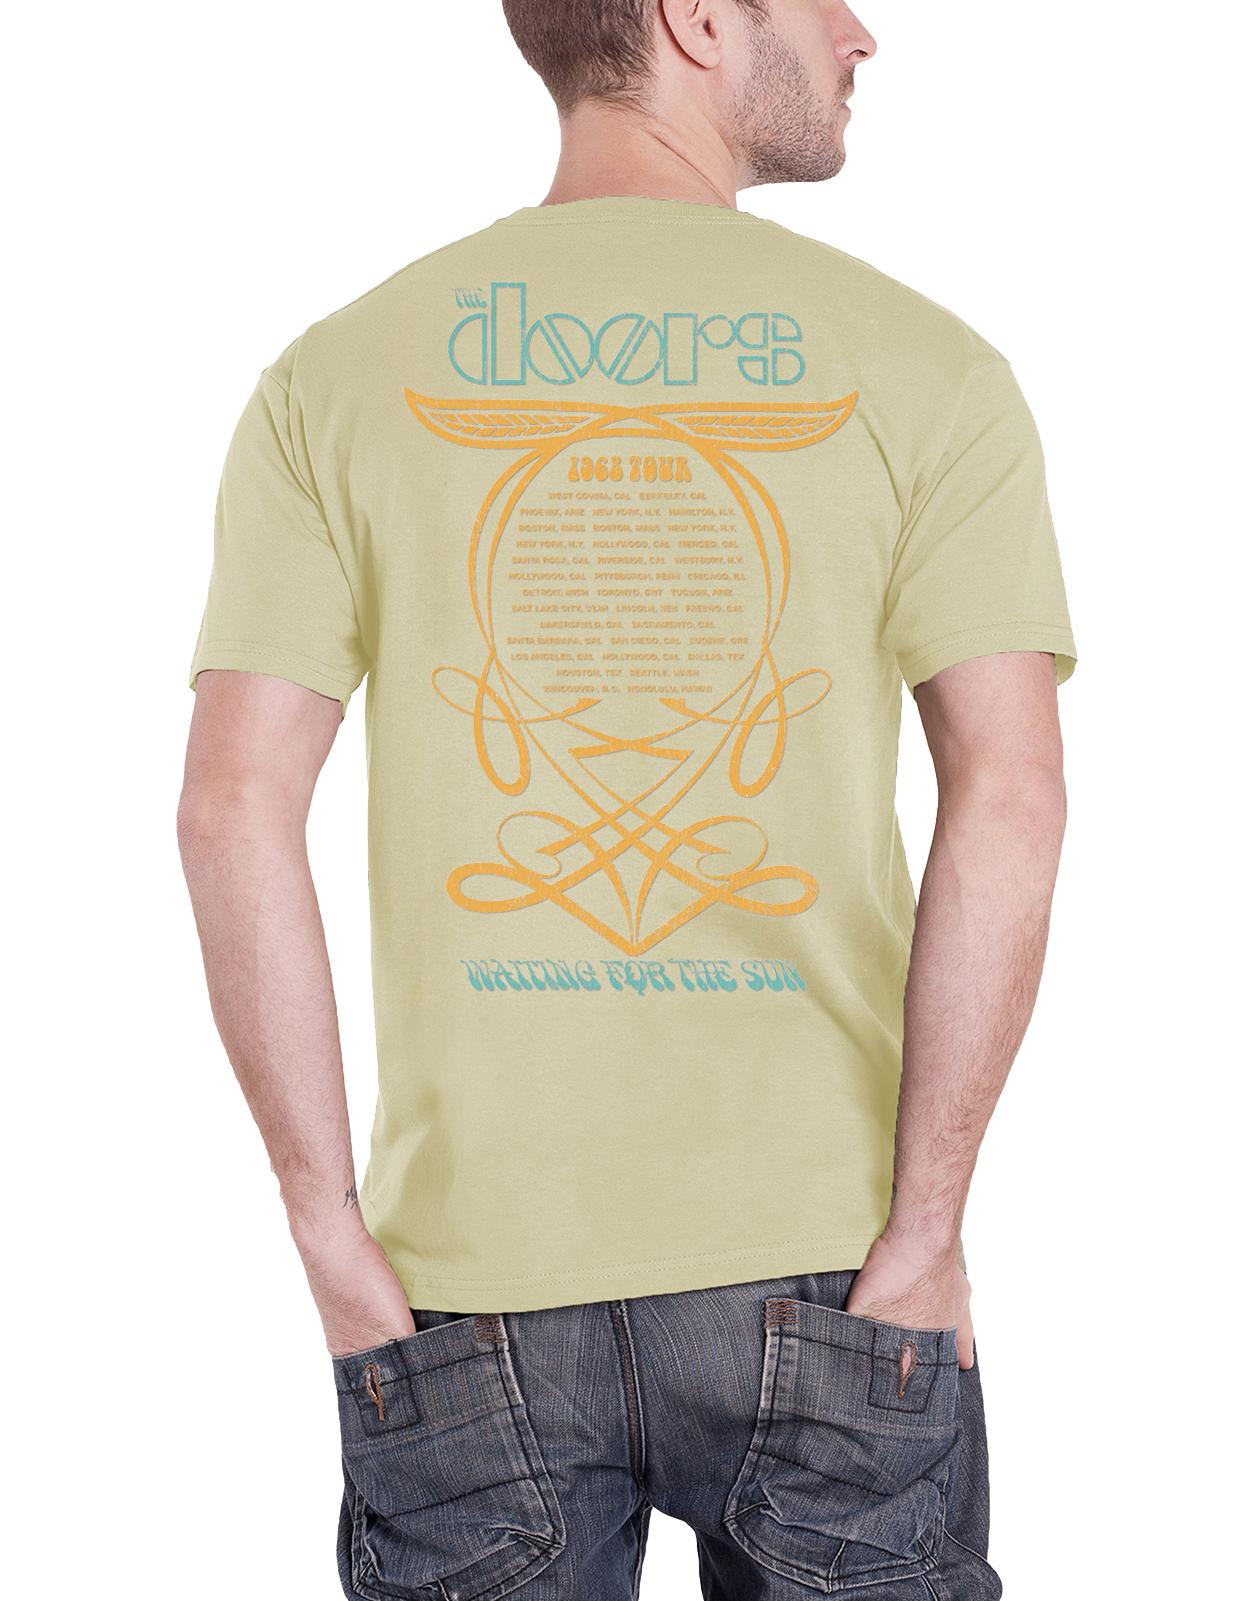 Officiel-The-Doors-T-Shirt-Jim-Morrison-poete-americain-Break-On-Through-Homme-NEUF miniature 3